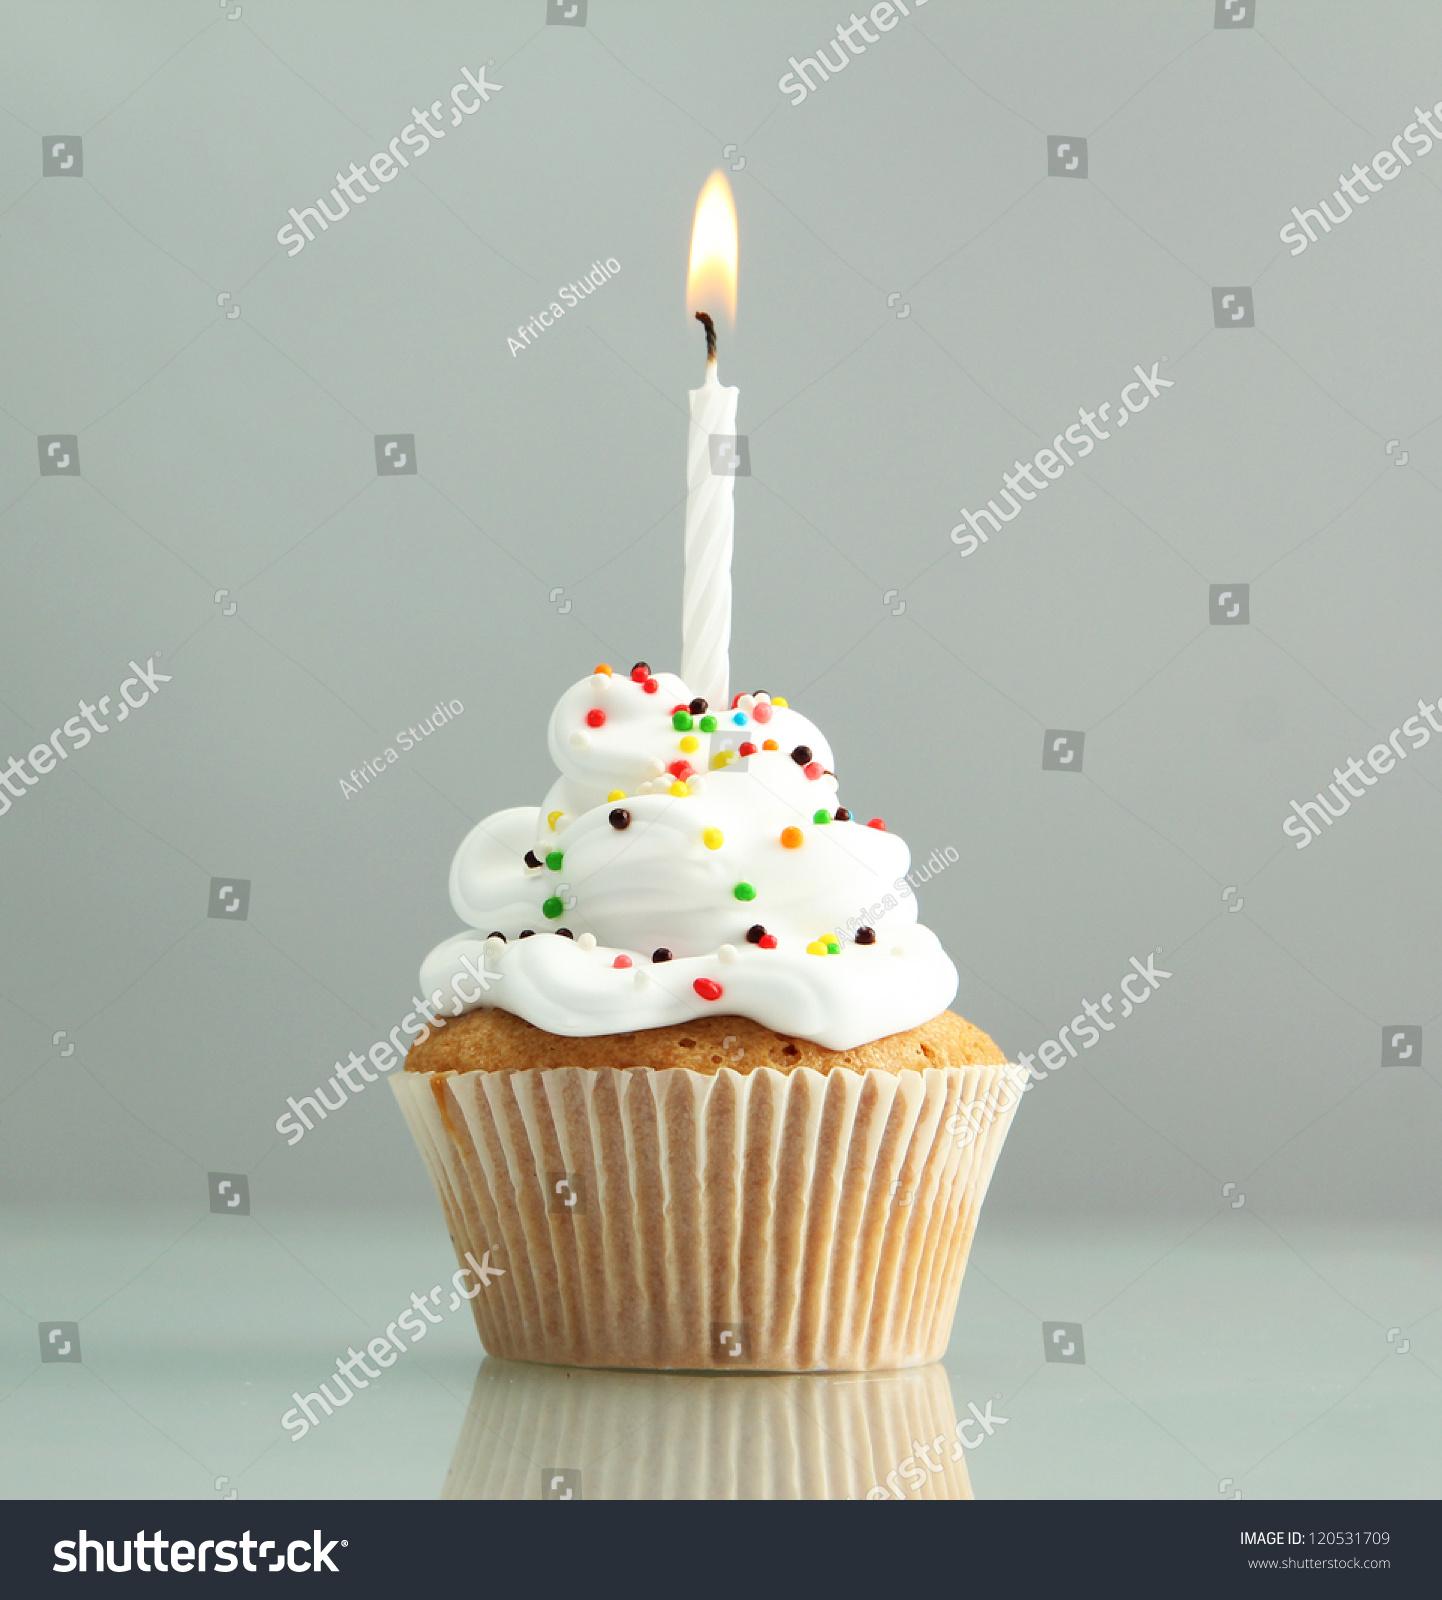 Tasty Birthday Cupcake Candle On Grey Stockfoto (Lizenzfrei ...